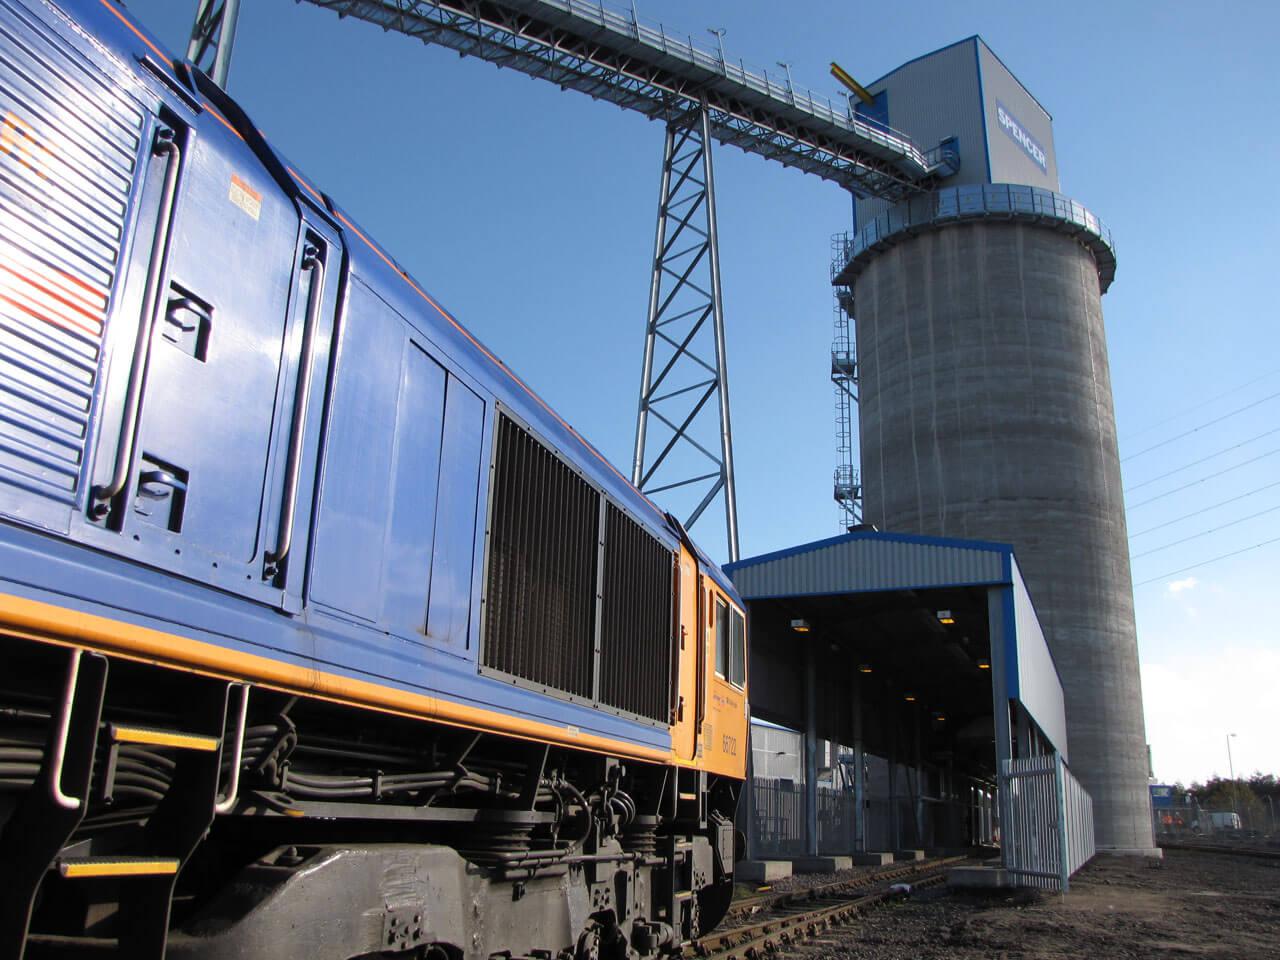 Port of Tyne Rail Loading of Biomass